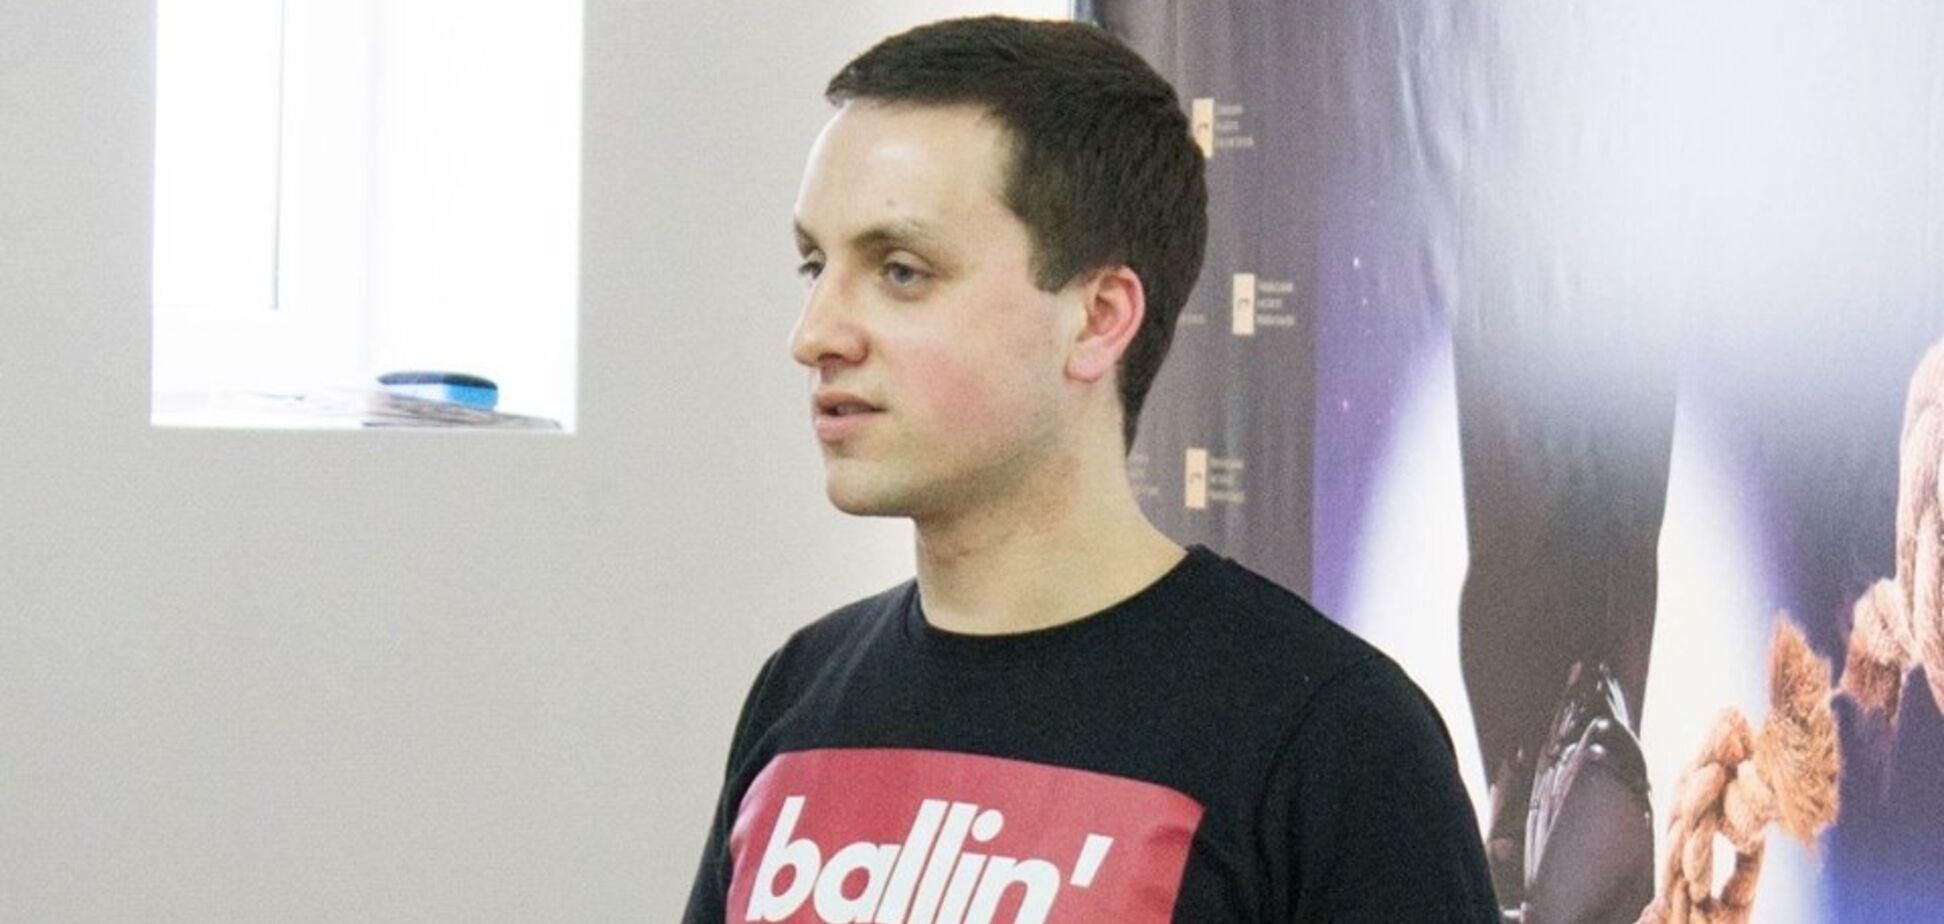 Помощник нардепа от БПП: в списке 'Слуги народа' обнаружили неожиданного кандидата